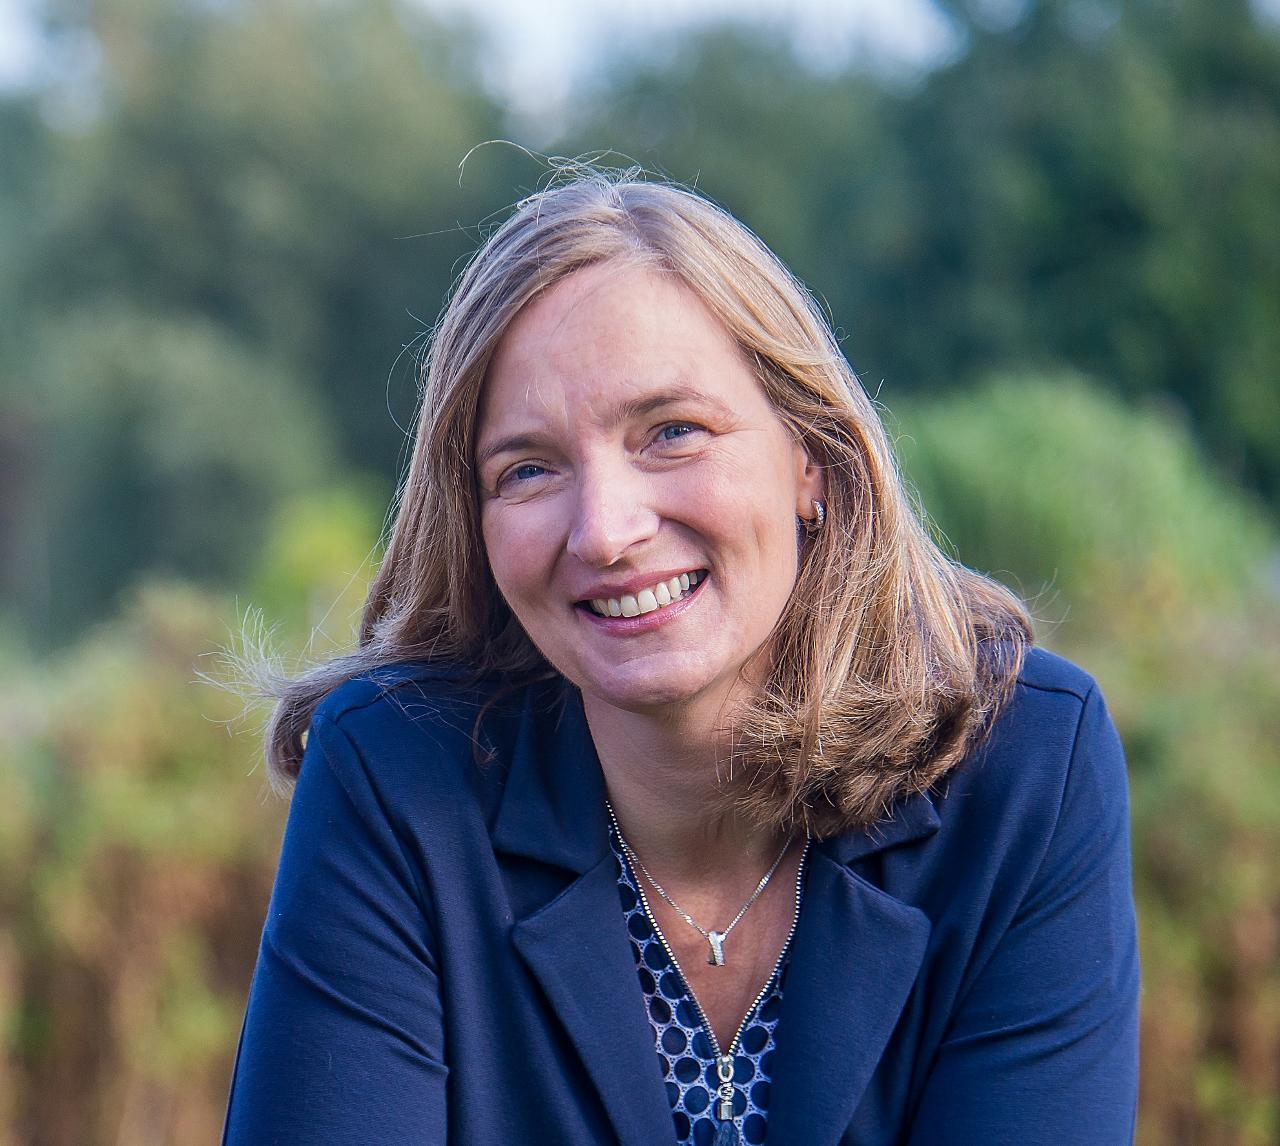 Hilde Feenstra spreekt op Graceland Festival 2019 over duurzaam leven